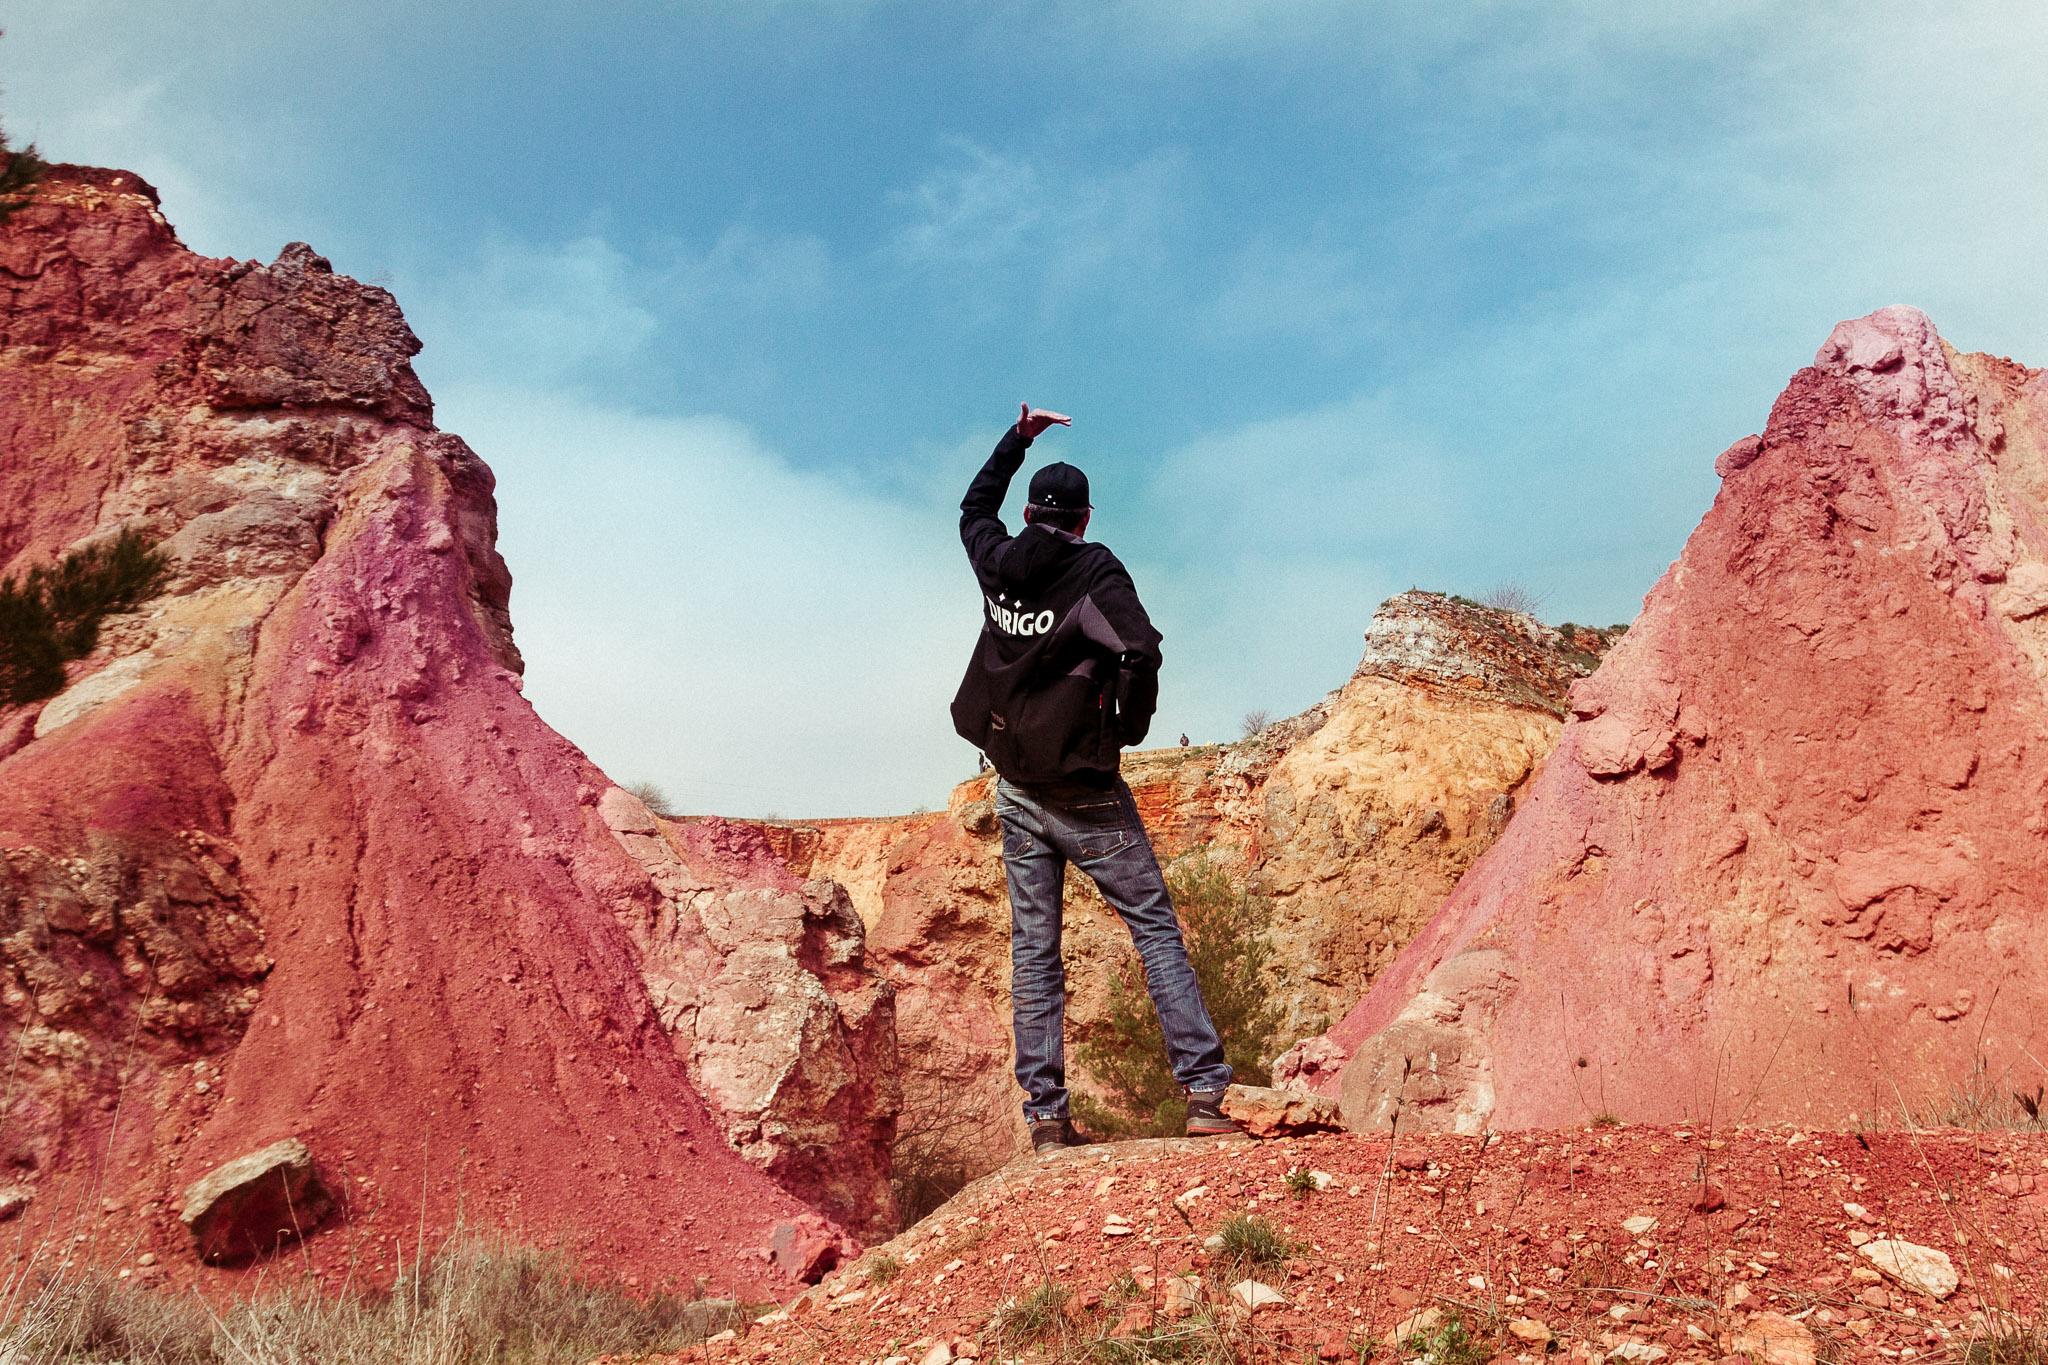 Dirigo Offroad Tour - Cave di Bauxite, Spinazzola